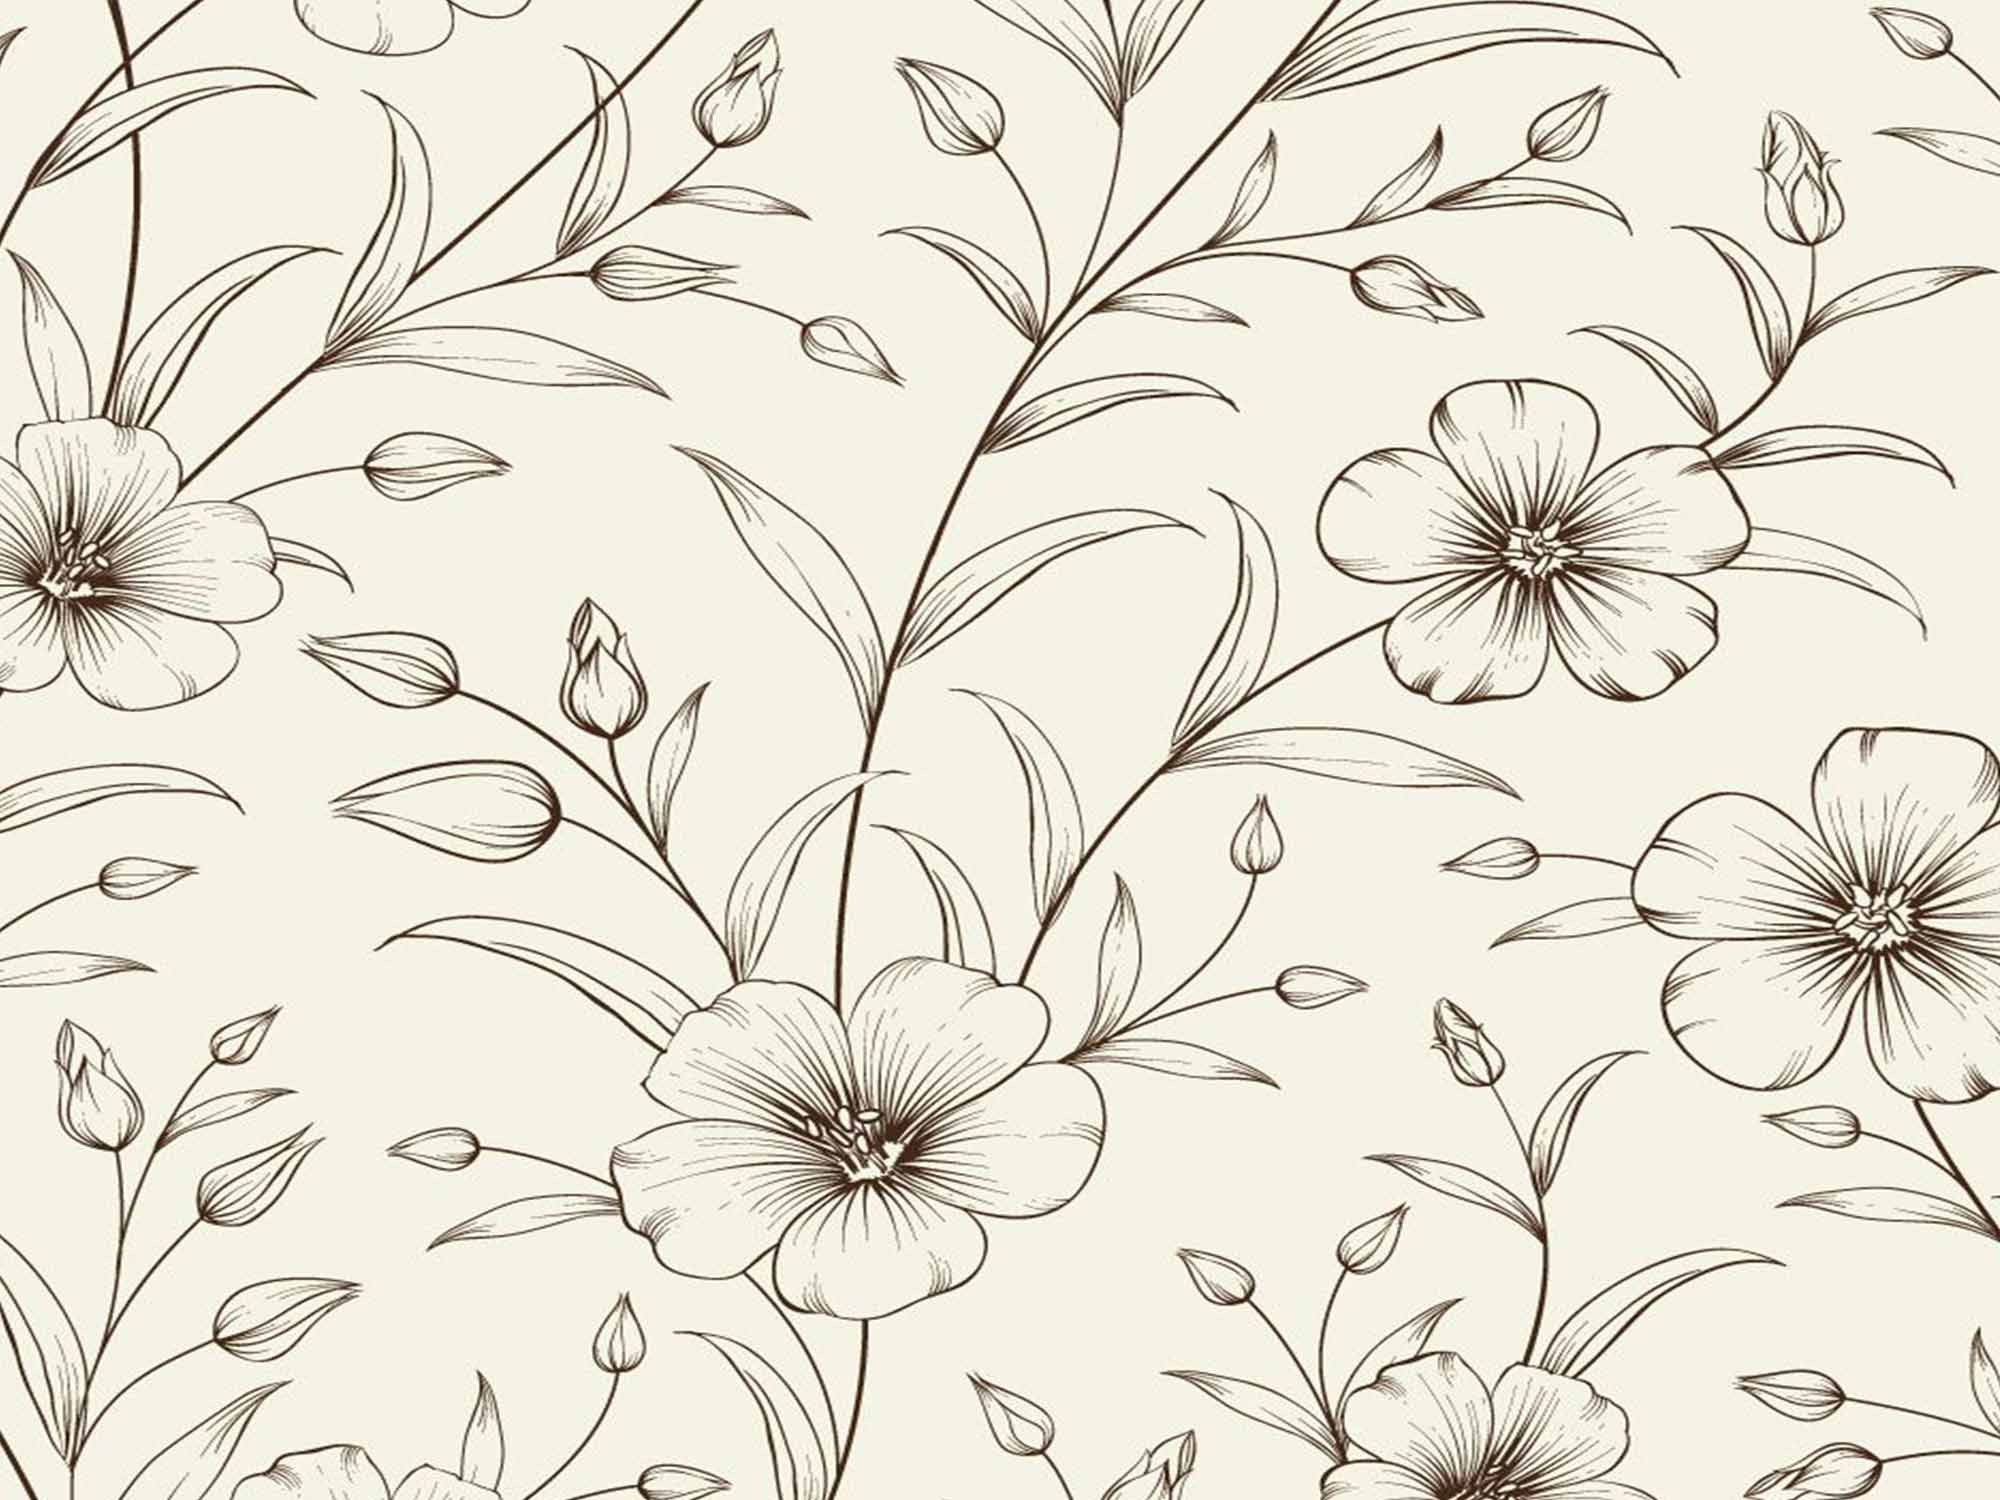 Papel de Parede Floral 0006 - Adesivos de Parede  - Paredes Decoradas